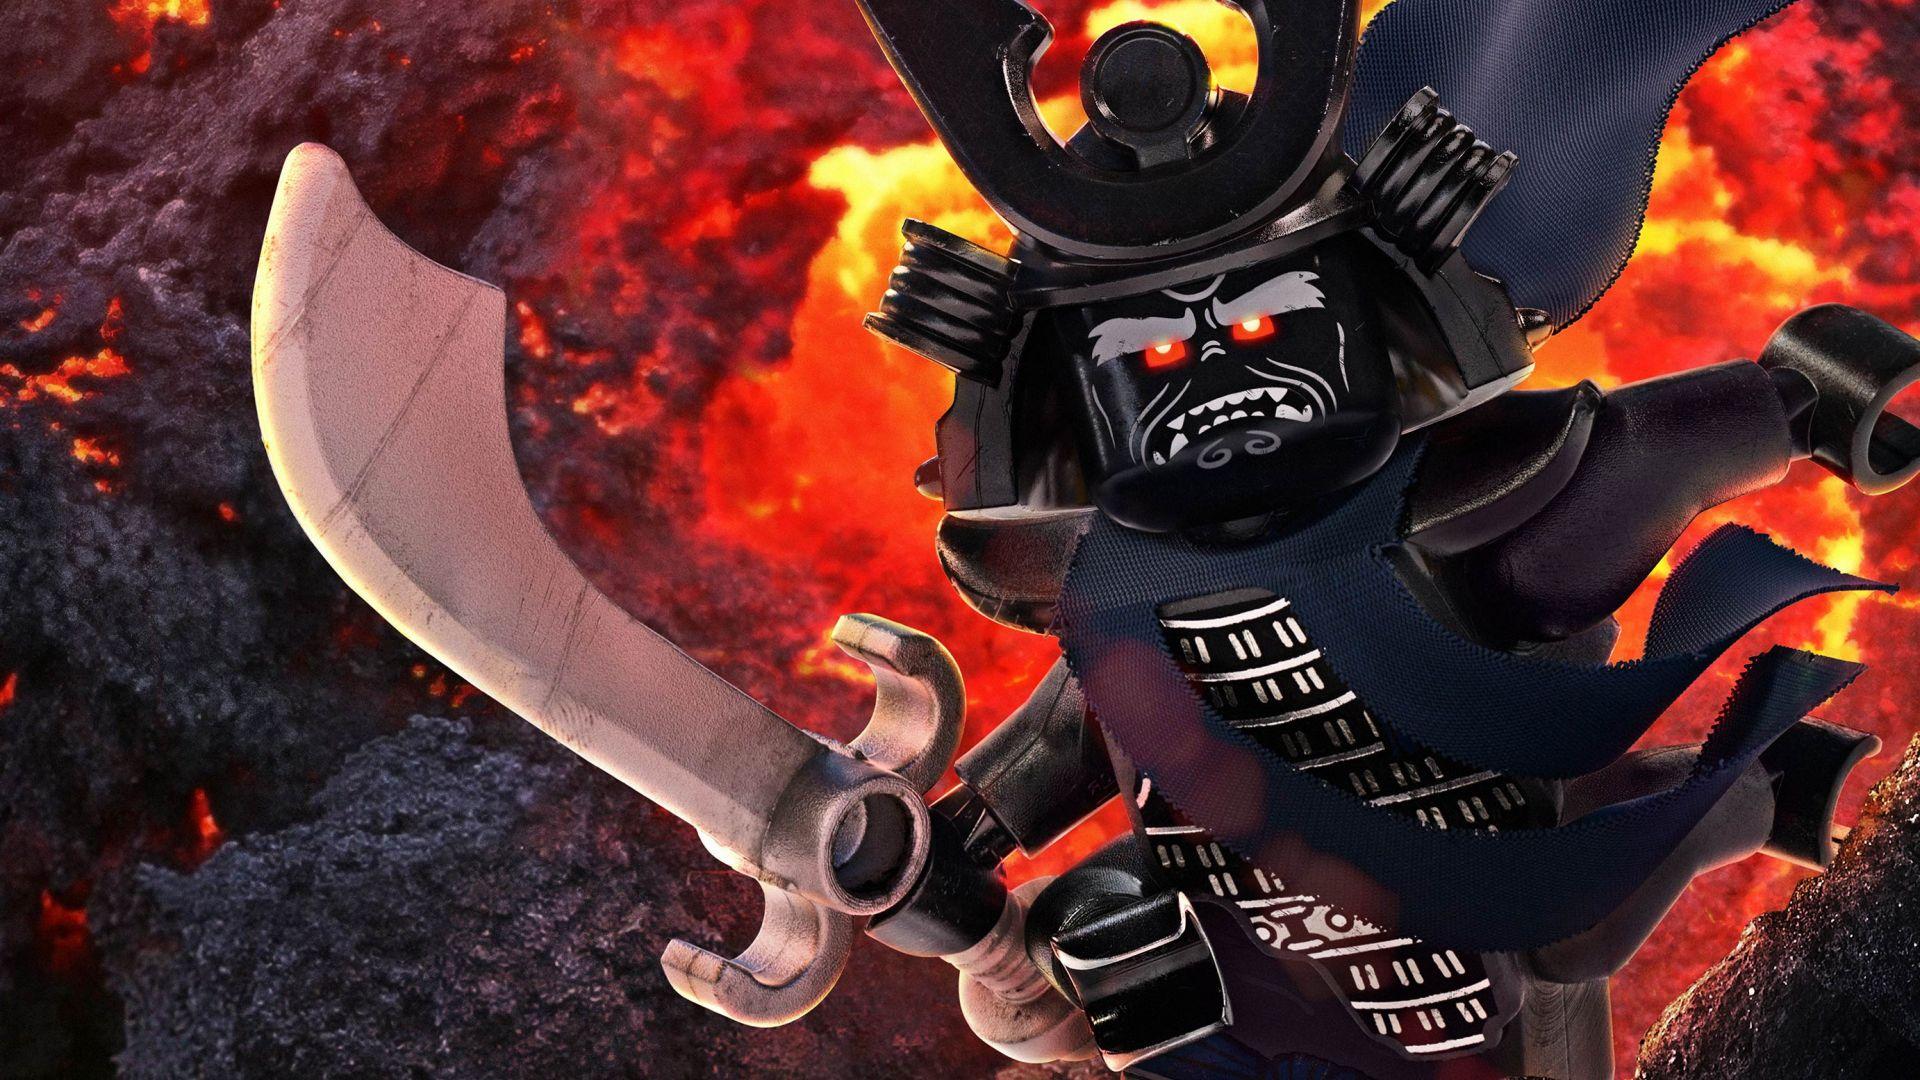 Wallpaper The LEGO Ninjago Movie Garmadon 4k Movies 14482